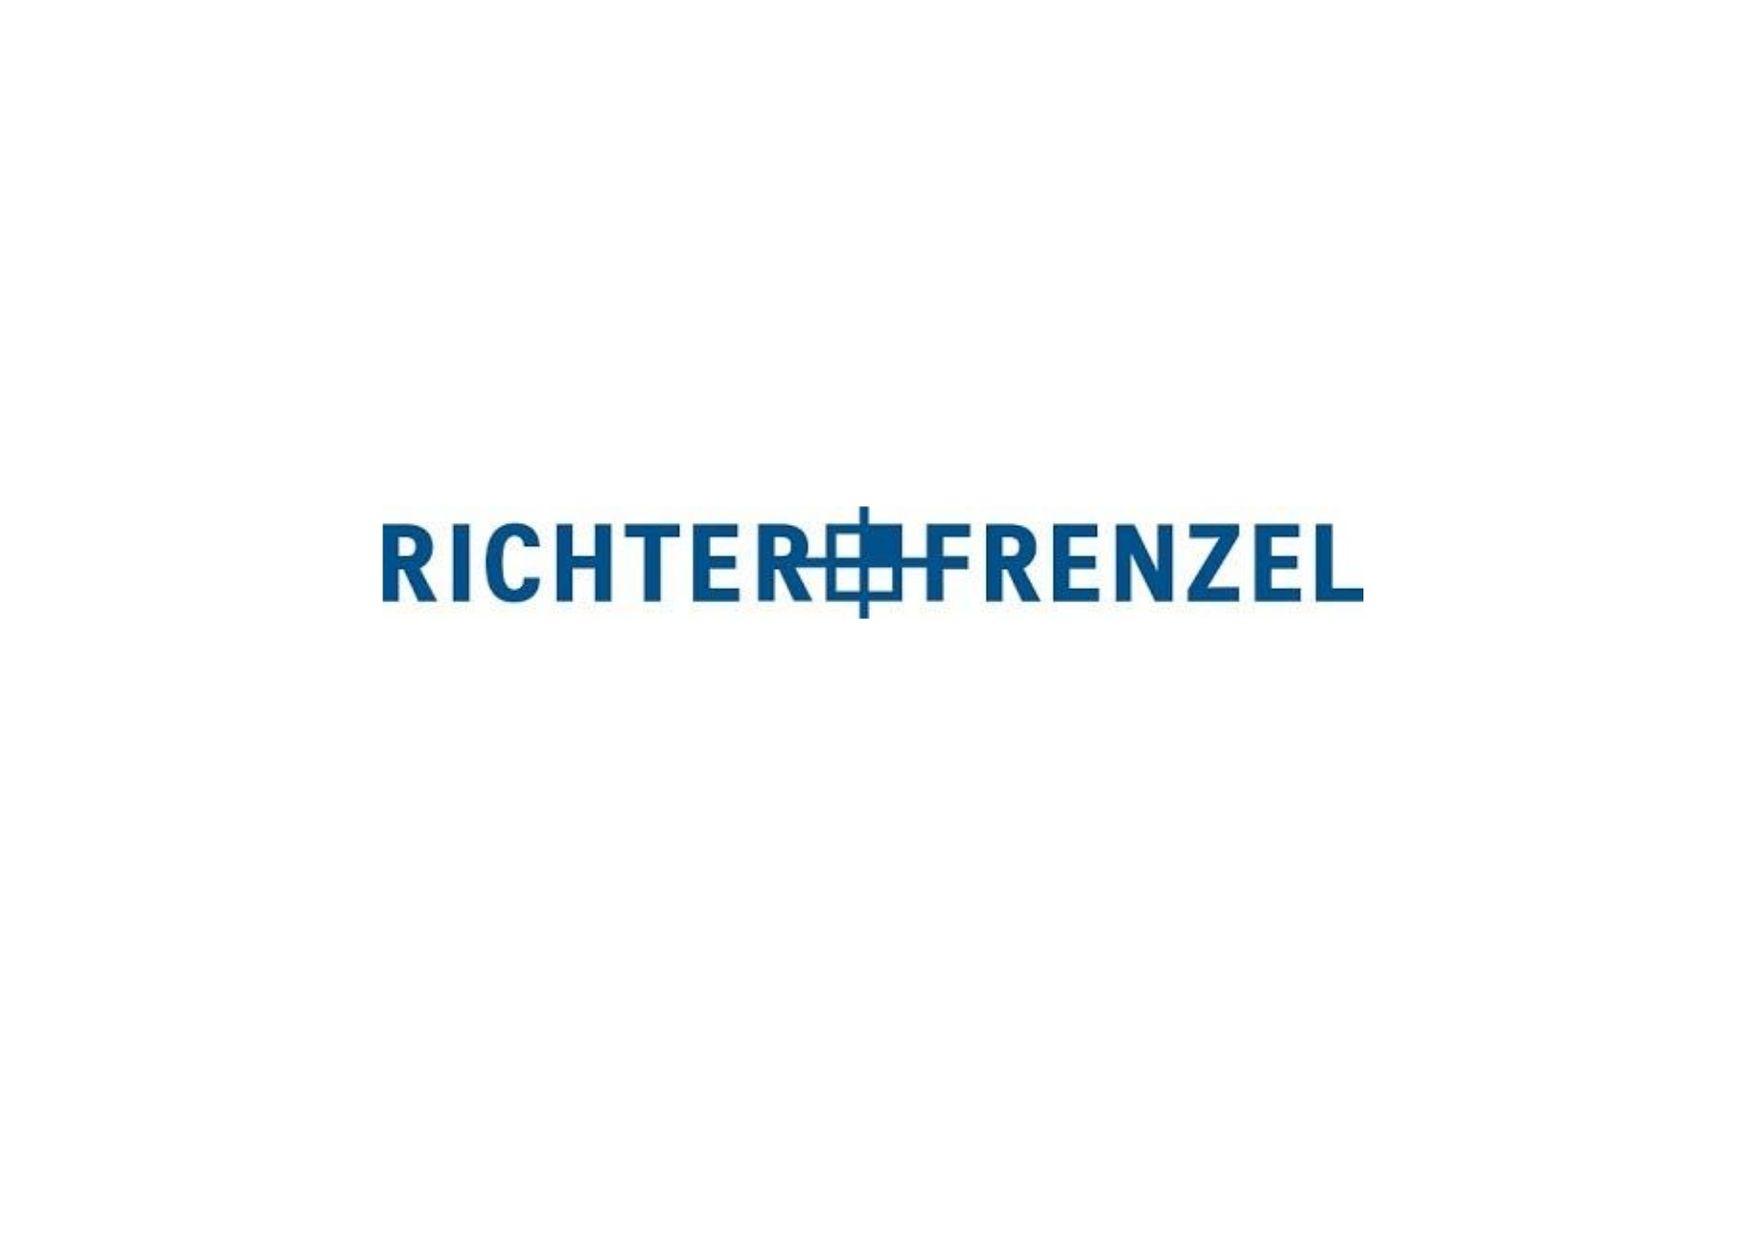 Richter & Frenzel